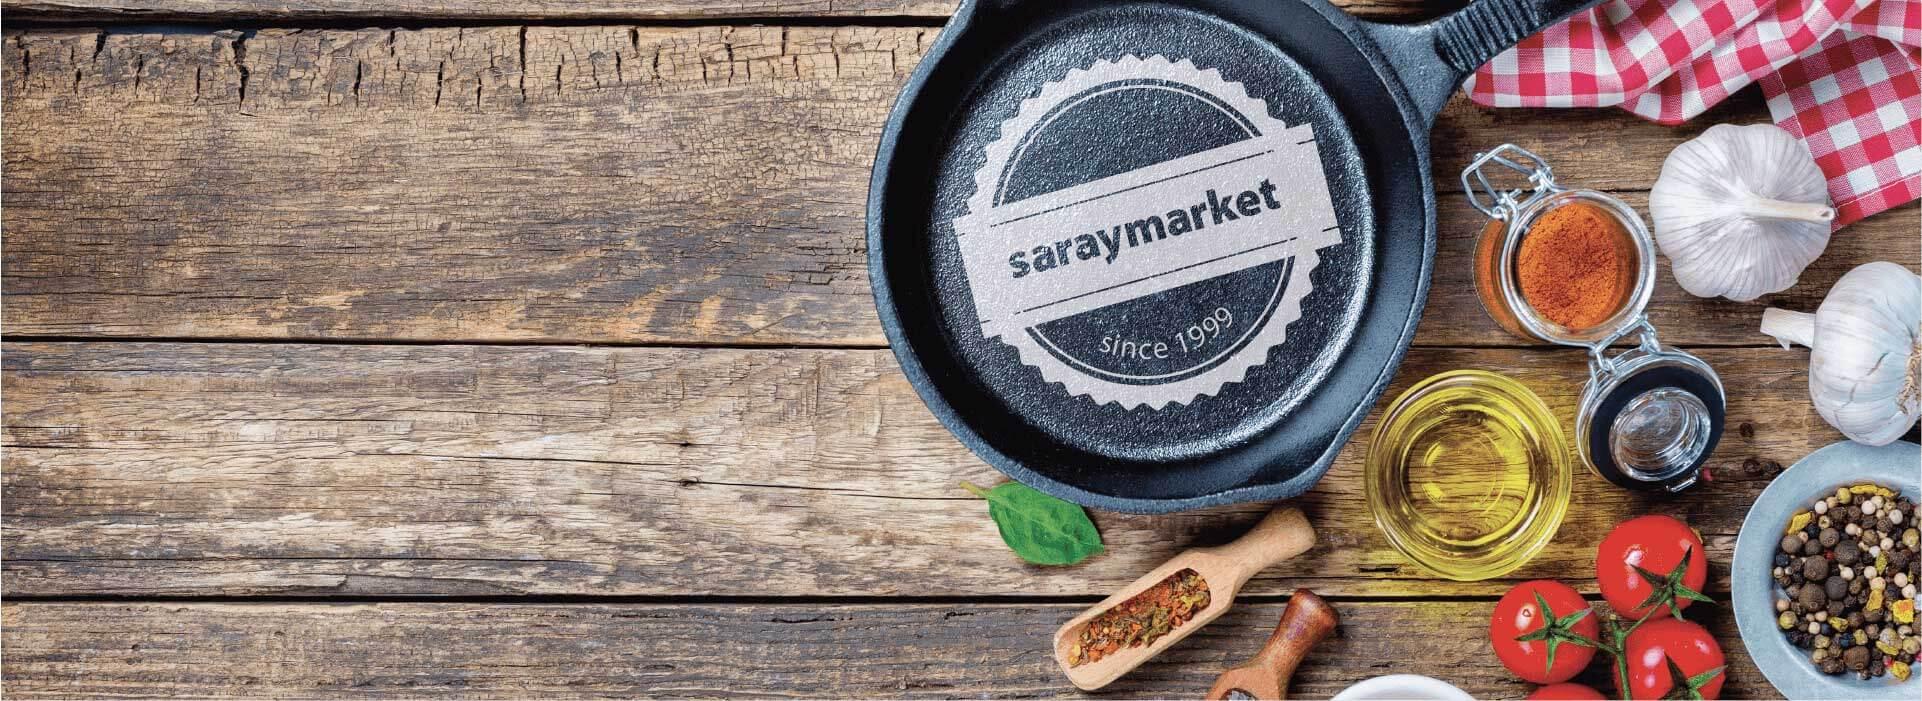 Saraymarket since 1999